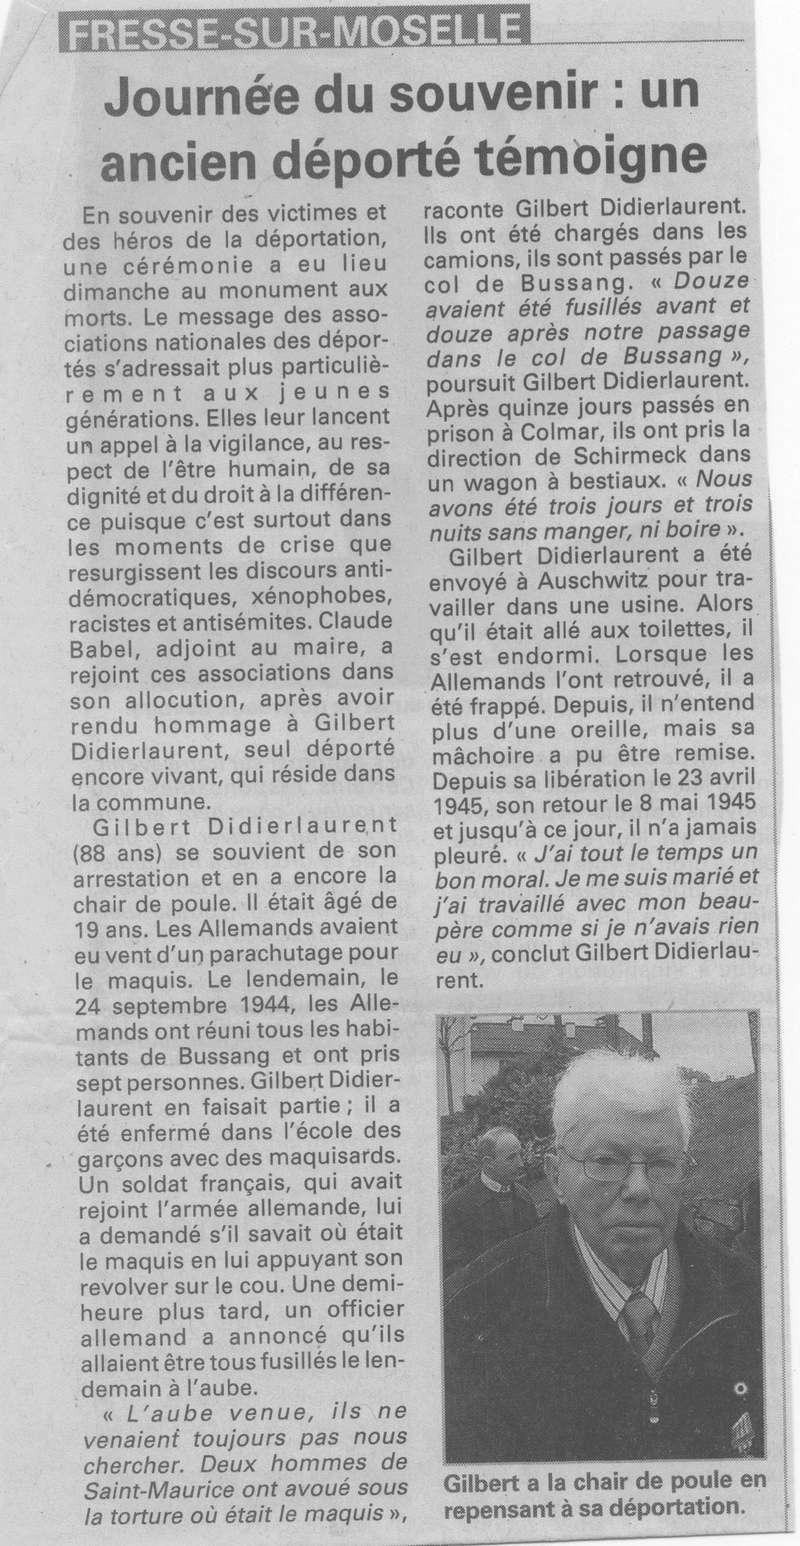 BUSSANG - SOUVENIRS DE GILBERT DIDIERLAURENT 39_00110